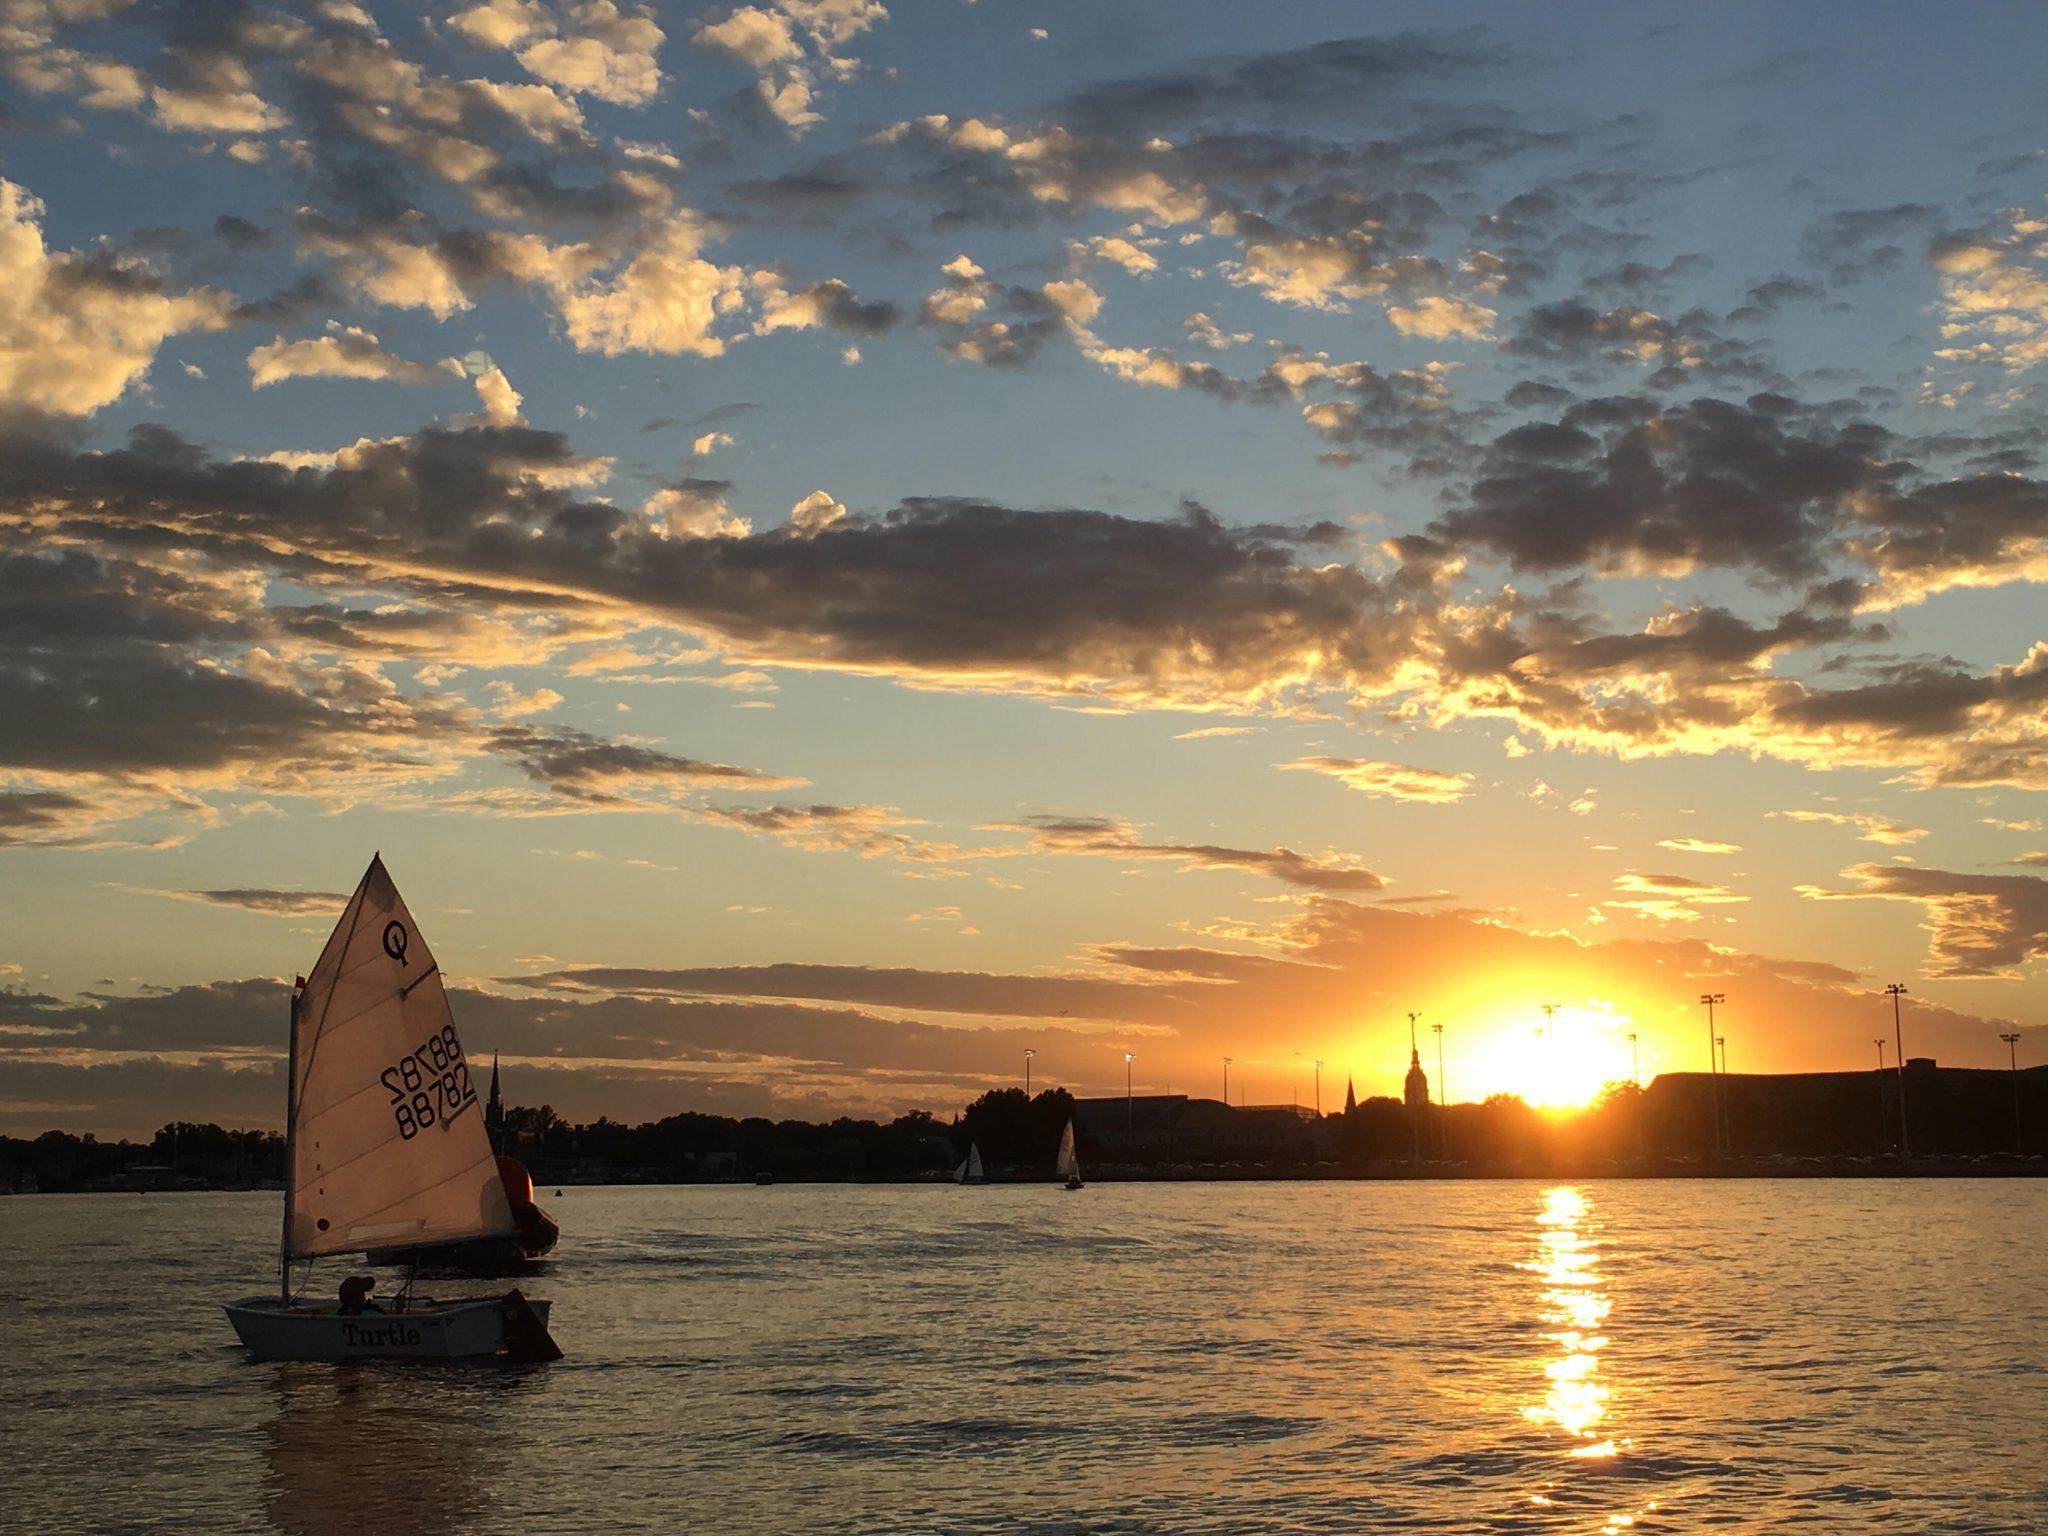 sunset, water, sailing